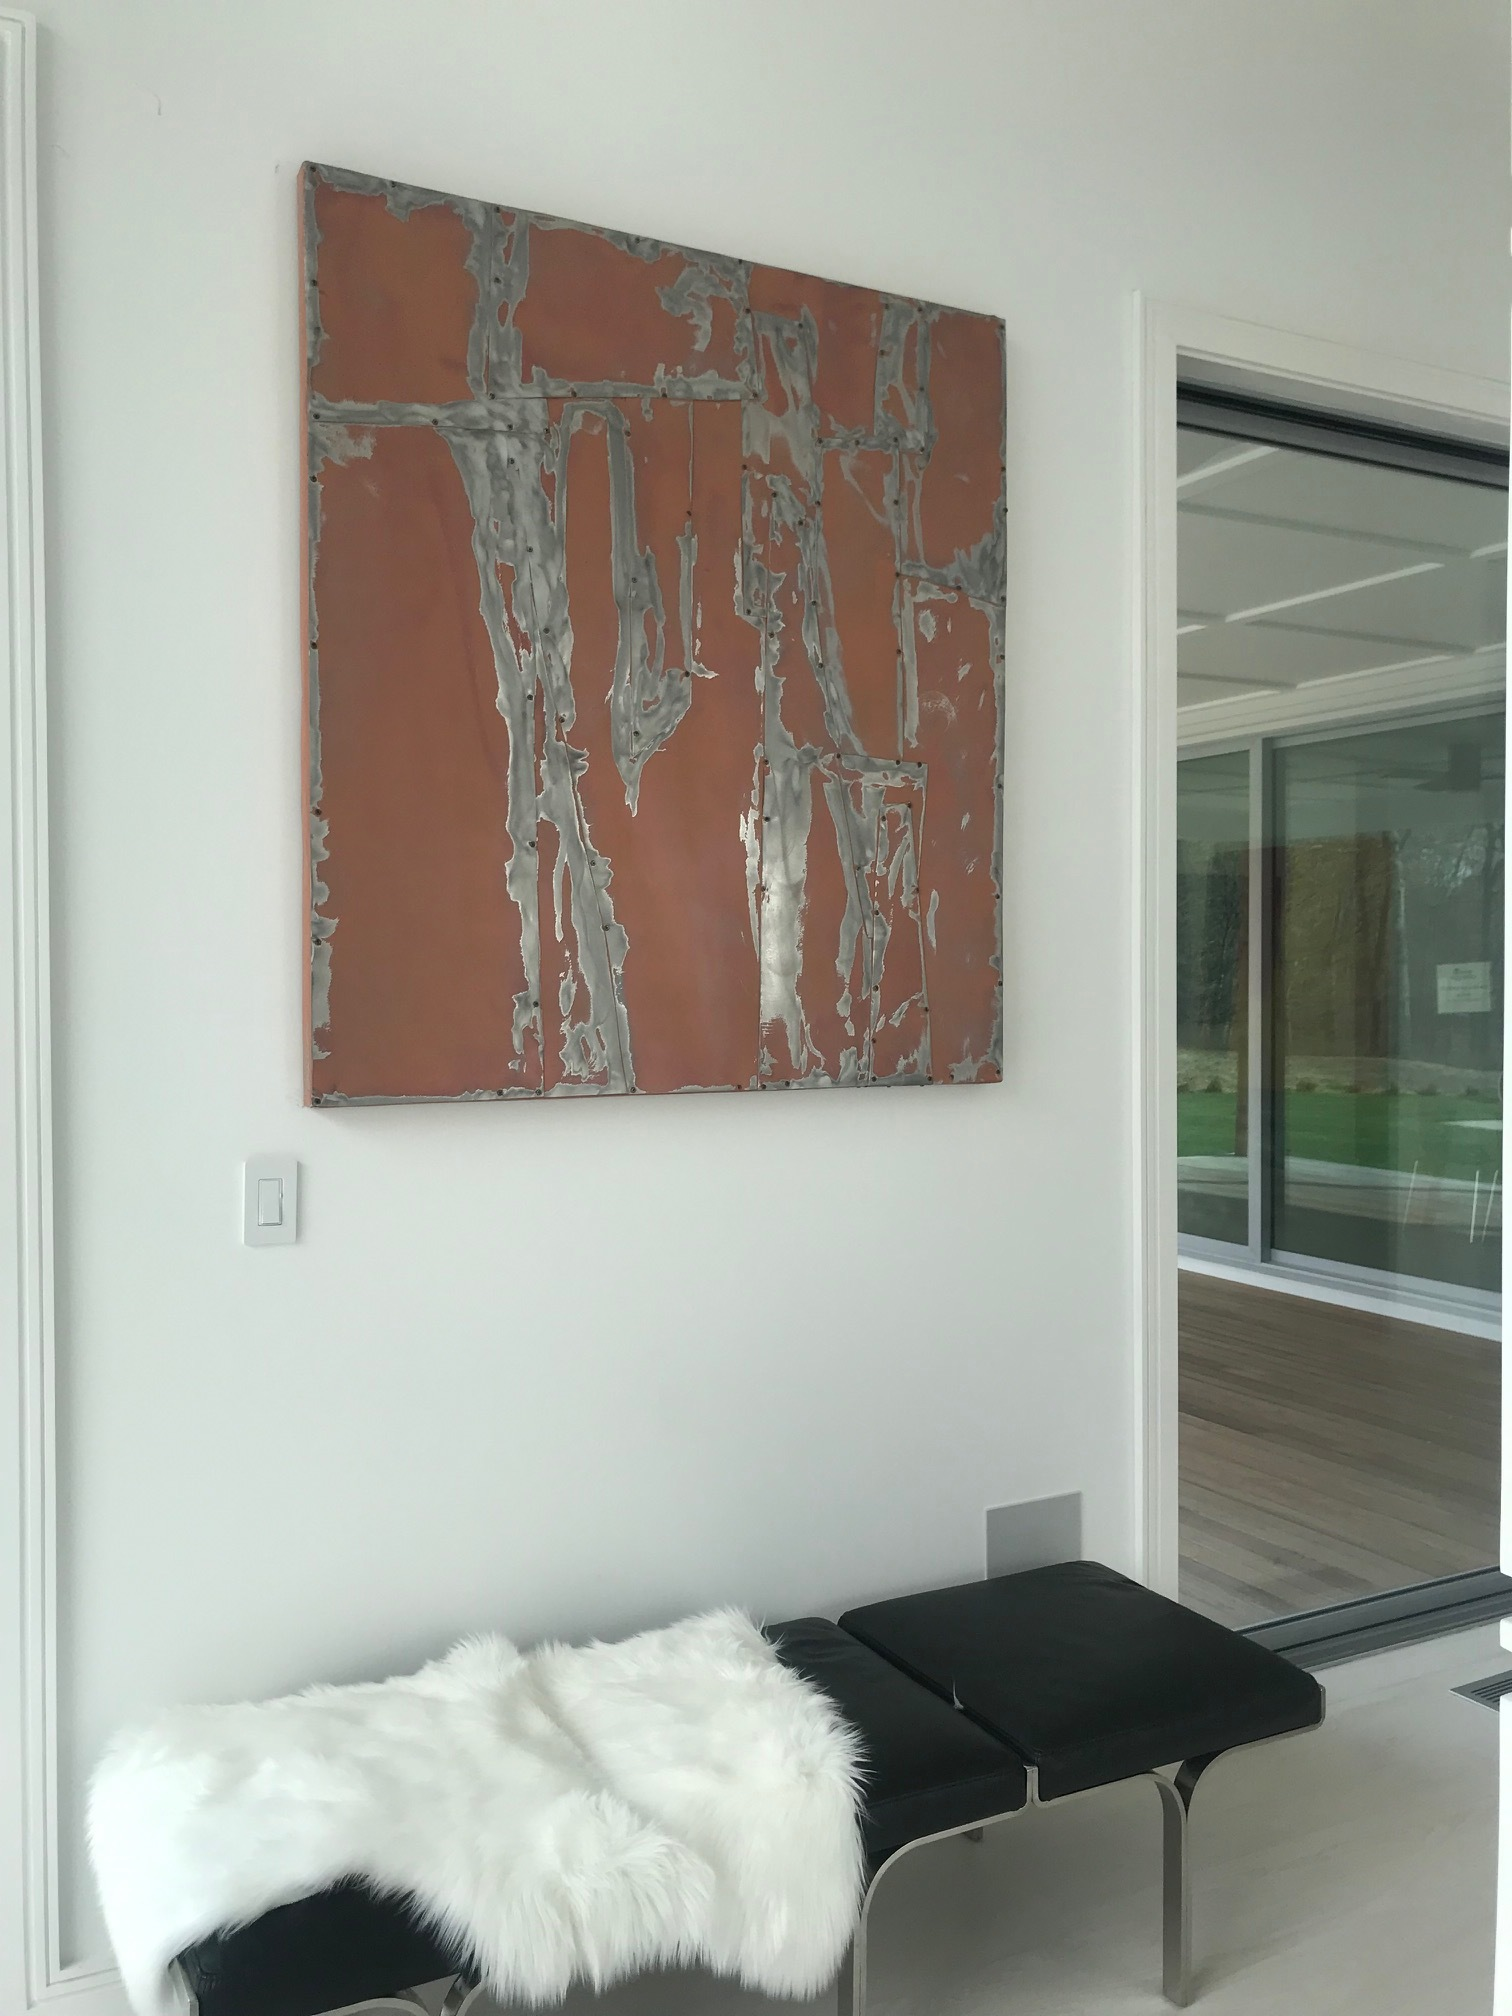 Leri's work in situ